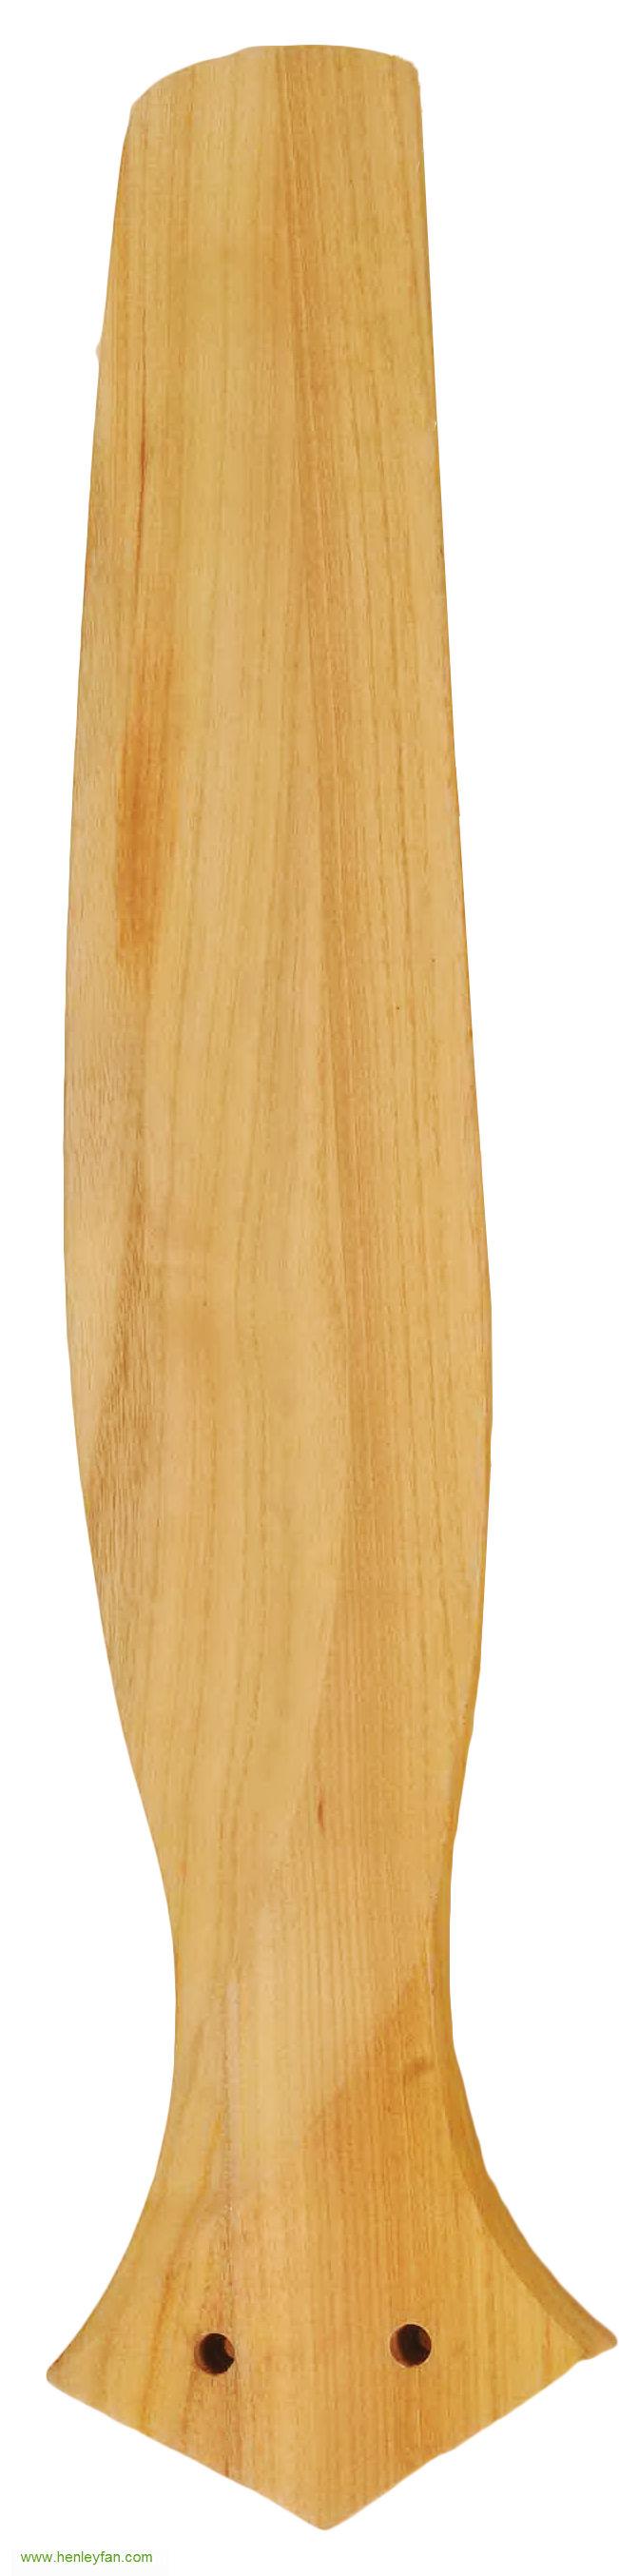 MrKen 3D Solid Wood Designer Low Energy DC Ceiling Fan - New 2016!